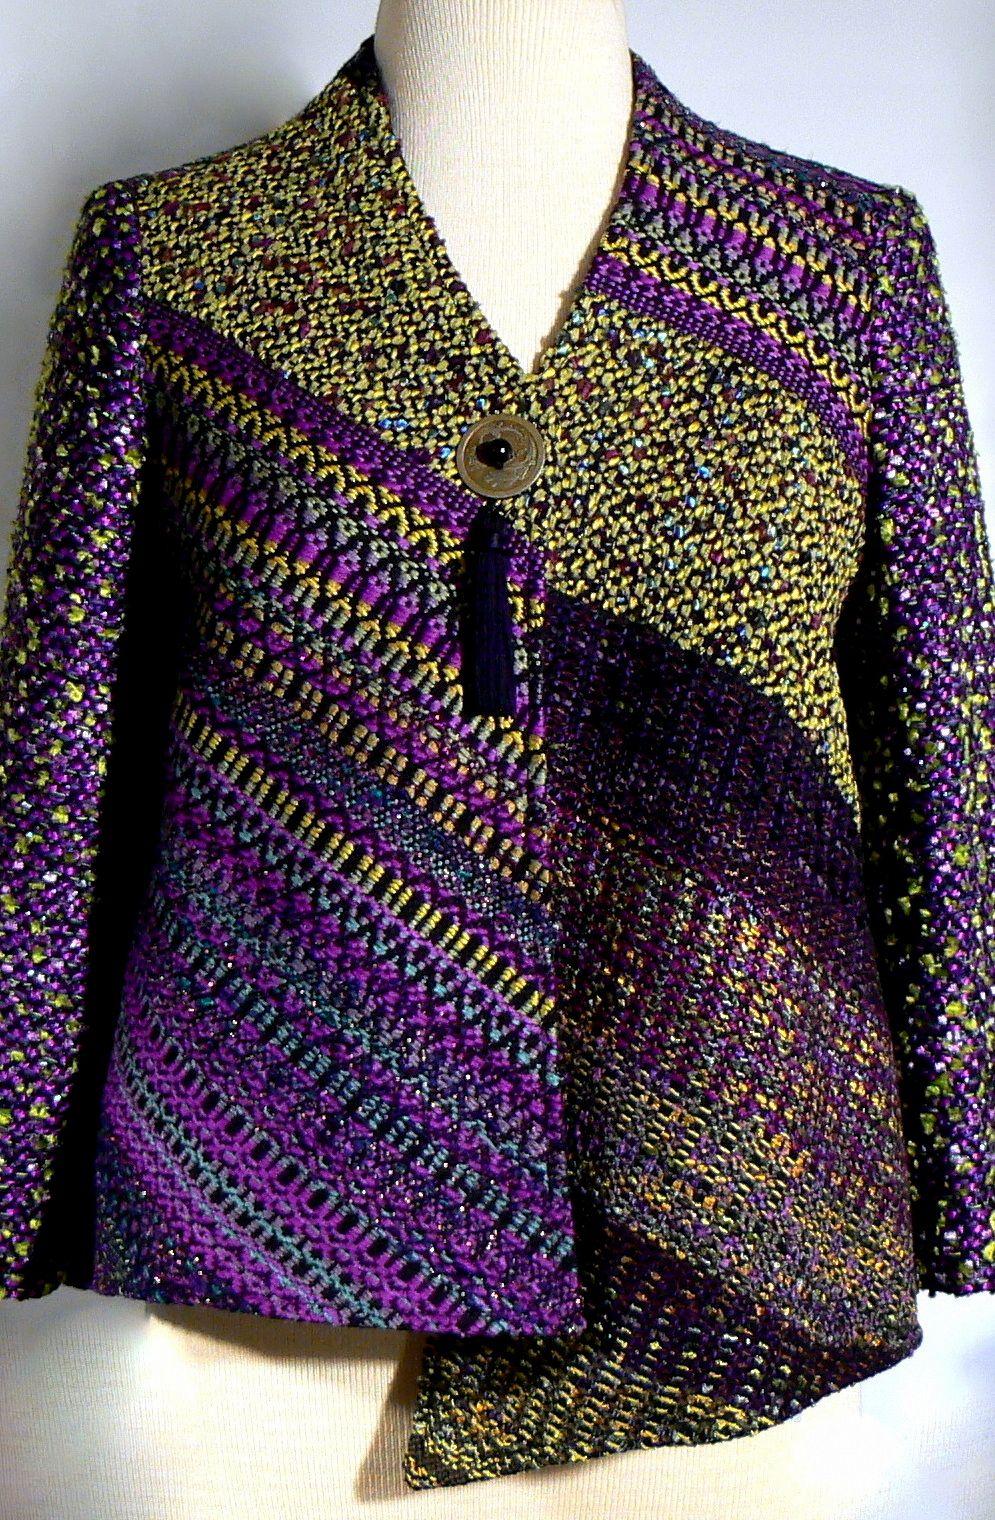 Handwoven Jacket Kathleen Weir-West 10-001.JPG | бохо | Pinterest ...